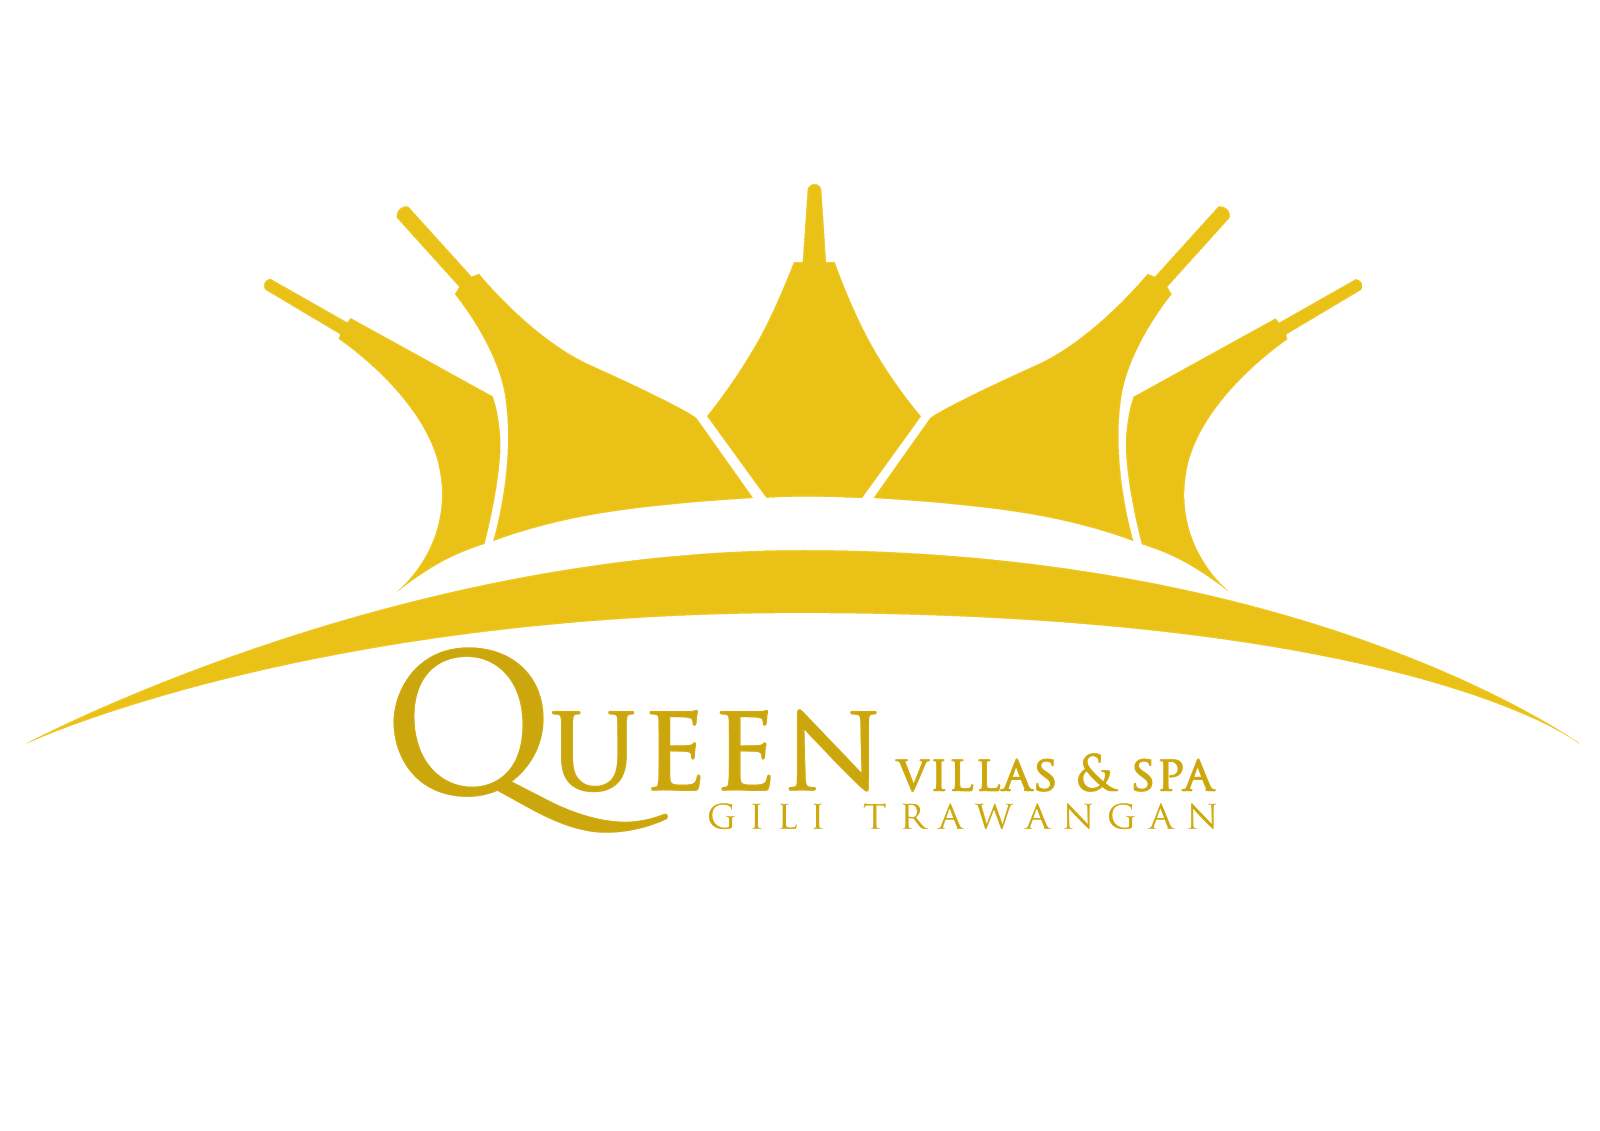 Queen crown logo design - photo#16